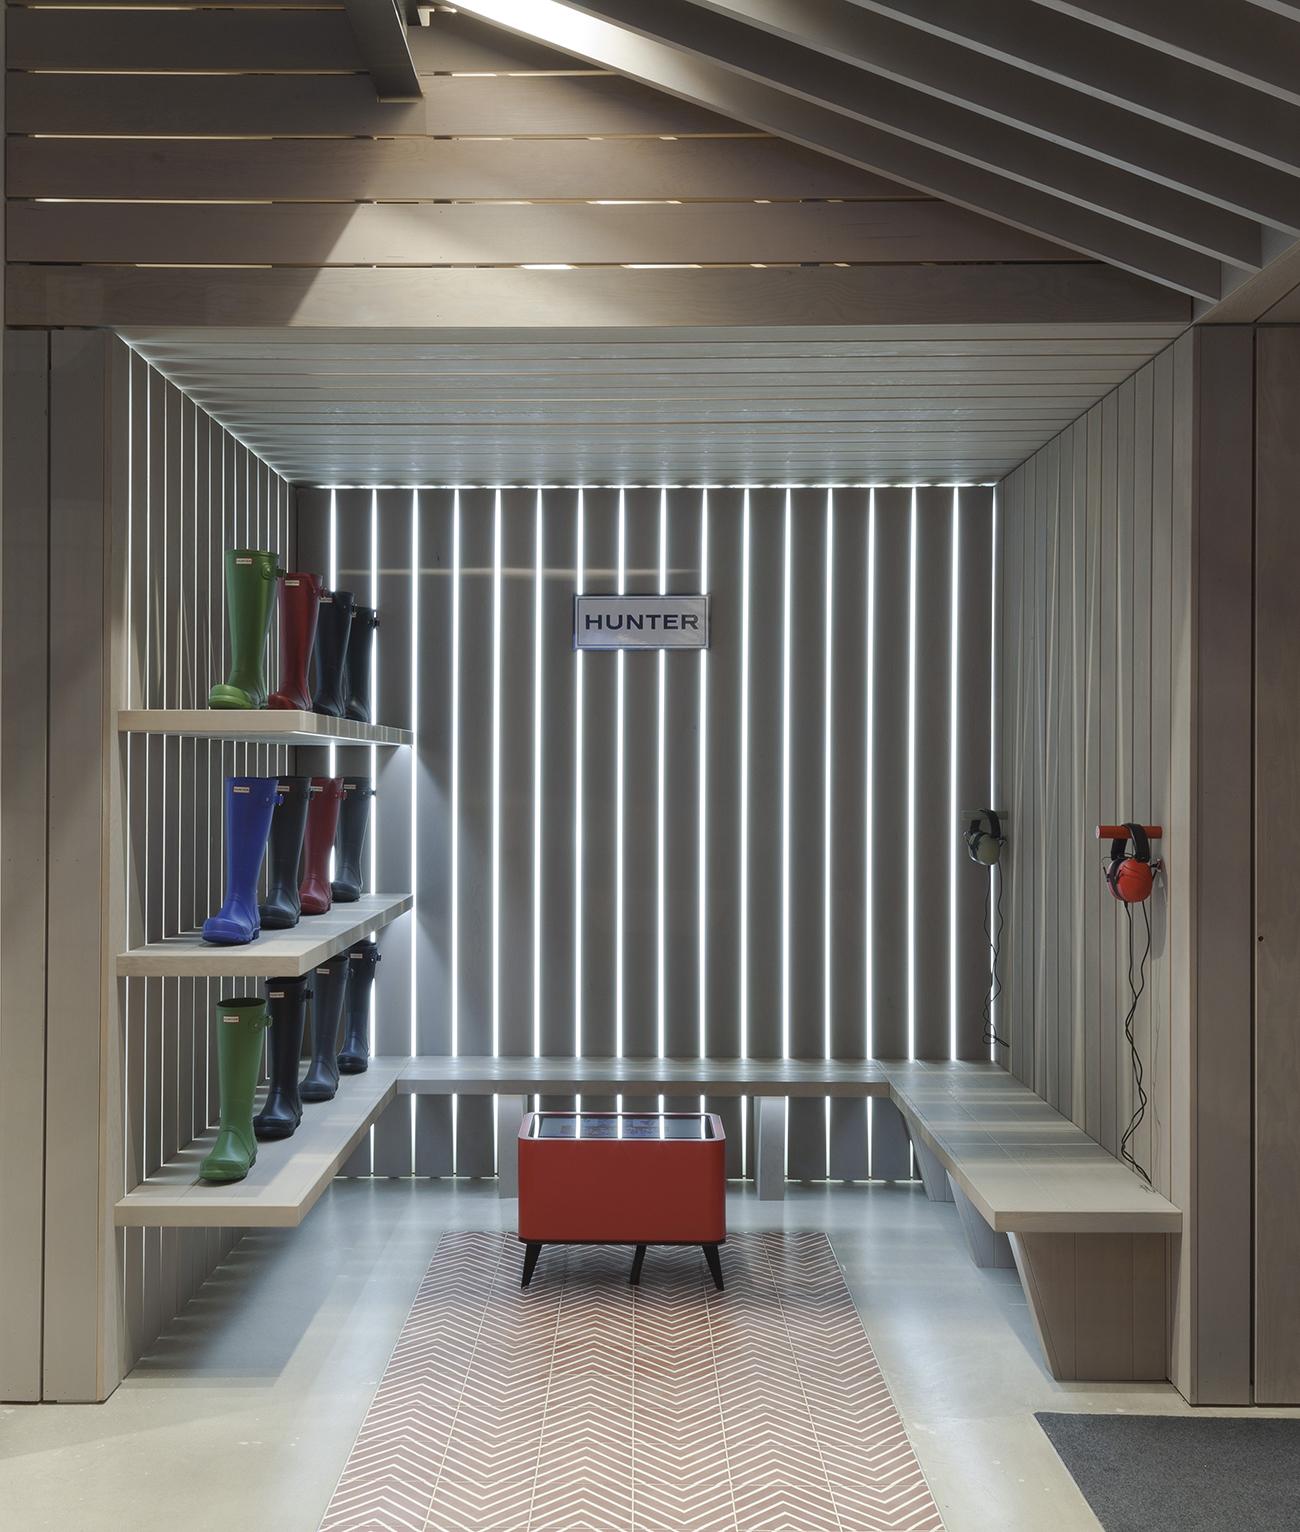 Checkland Kidleysides Design Hunter's First Global Flagship Store